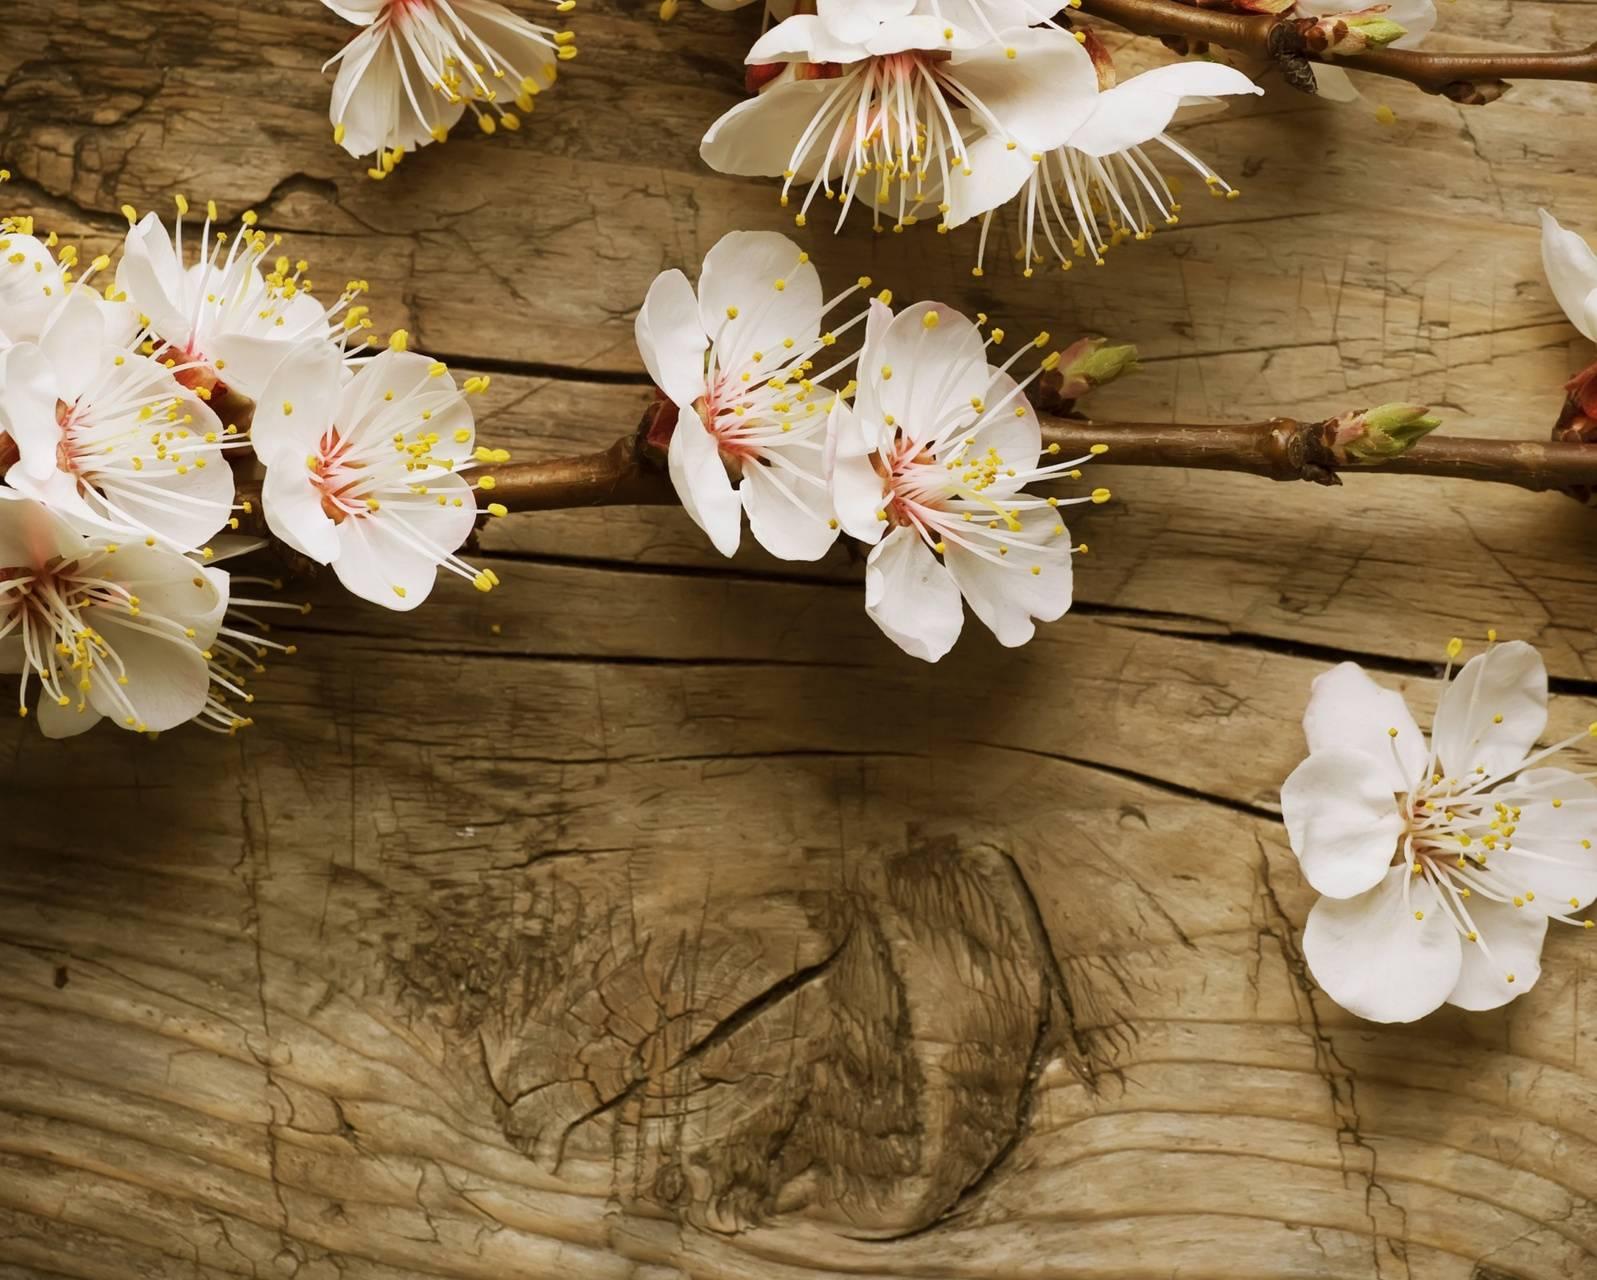 Wood Blossoms